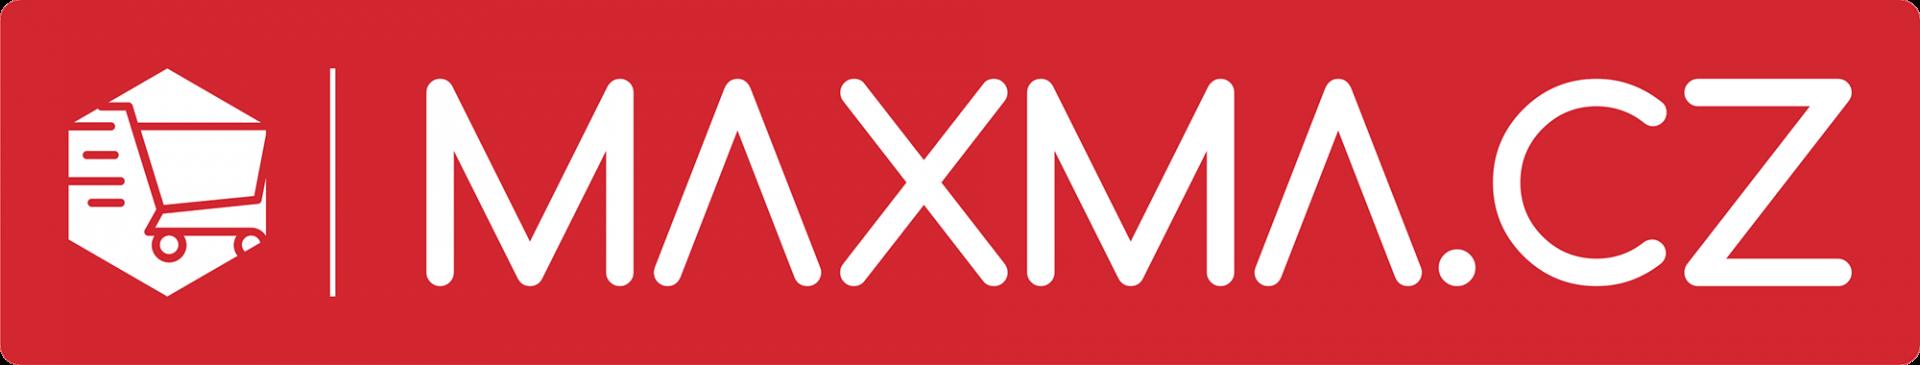 Maxma.cz